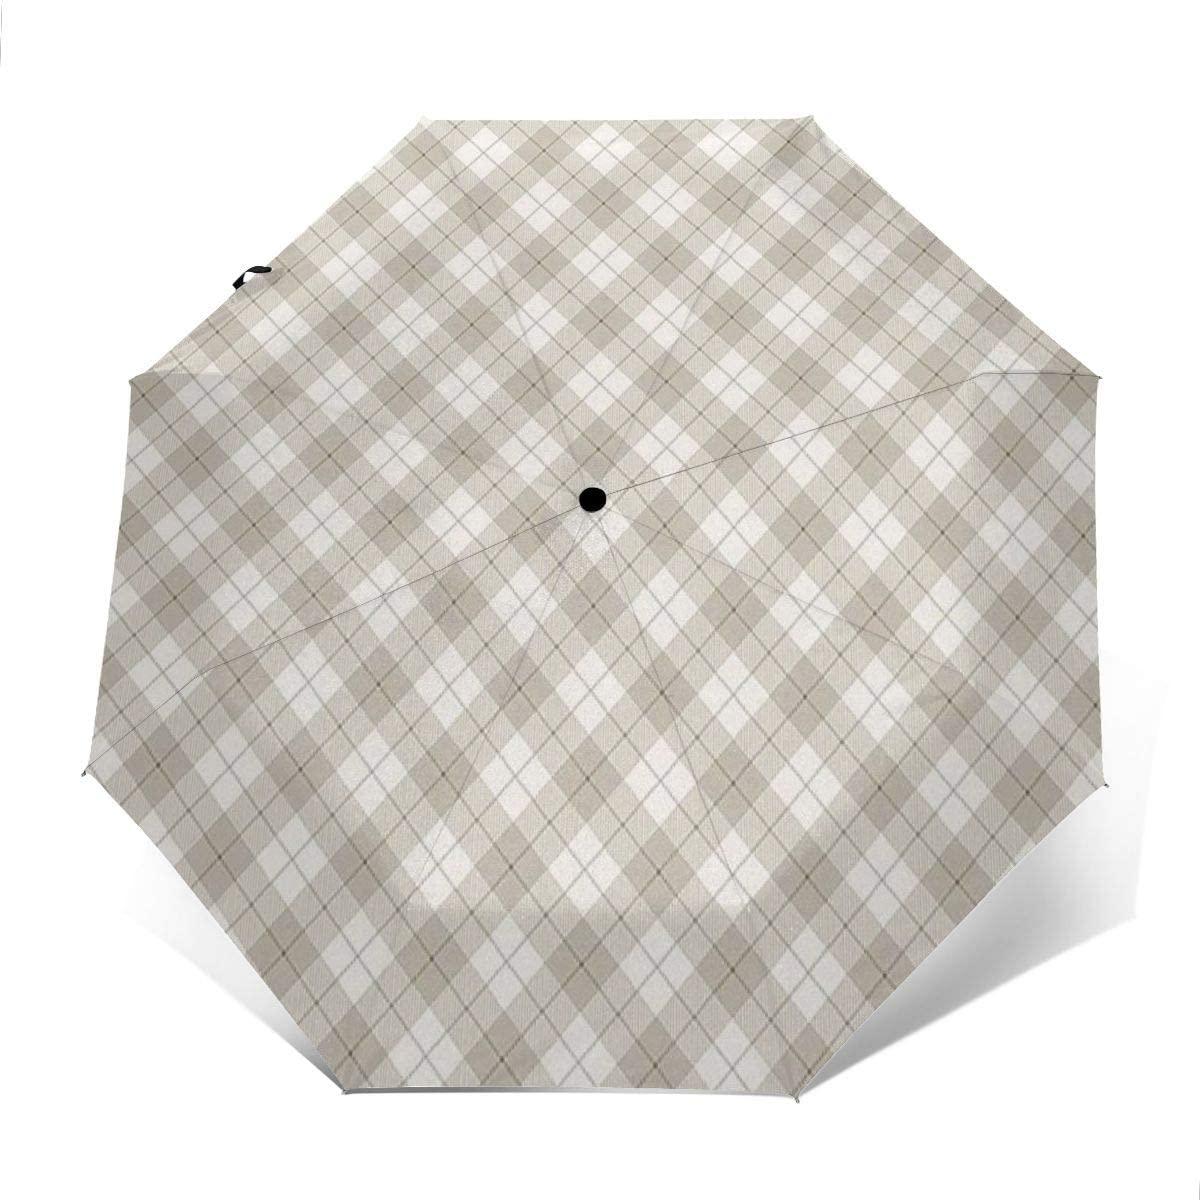 Auto Open and Close, Self Closing, Sun Rain Outdoor Umbrella - Diagonal Plaid Pattern Geometric Simplistic Checked And Striped Tile